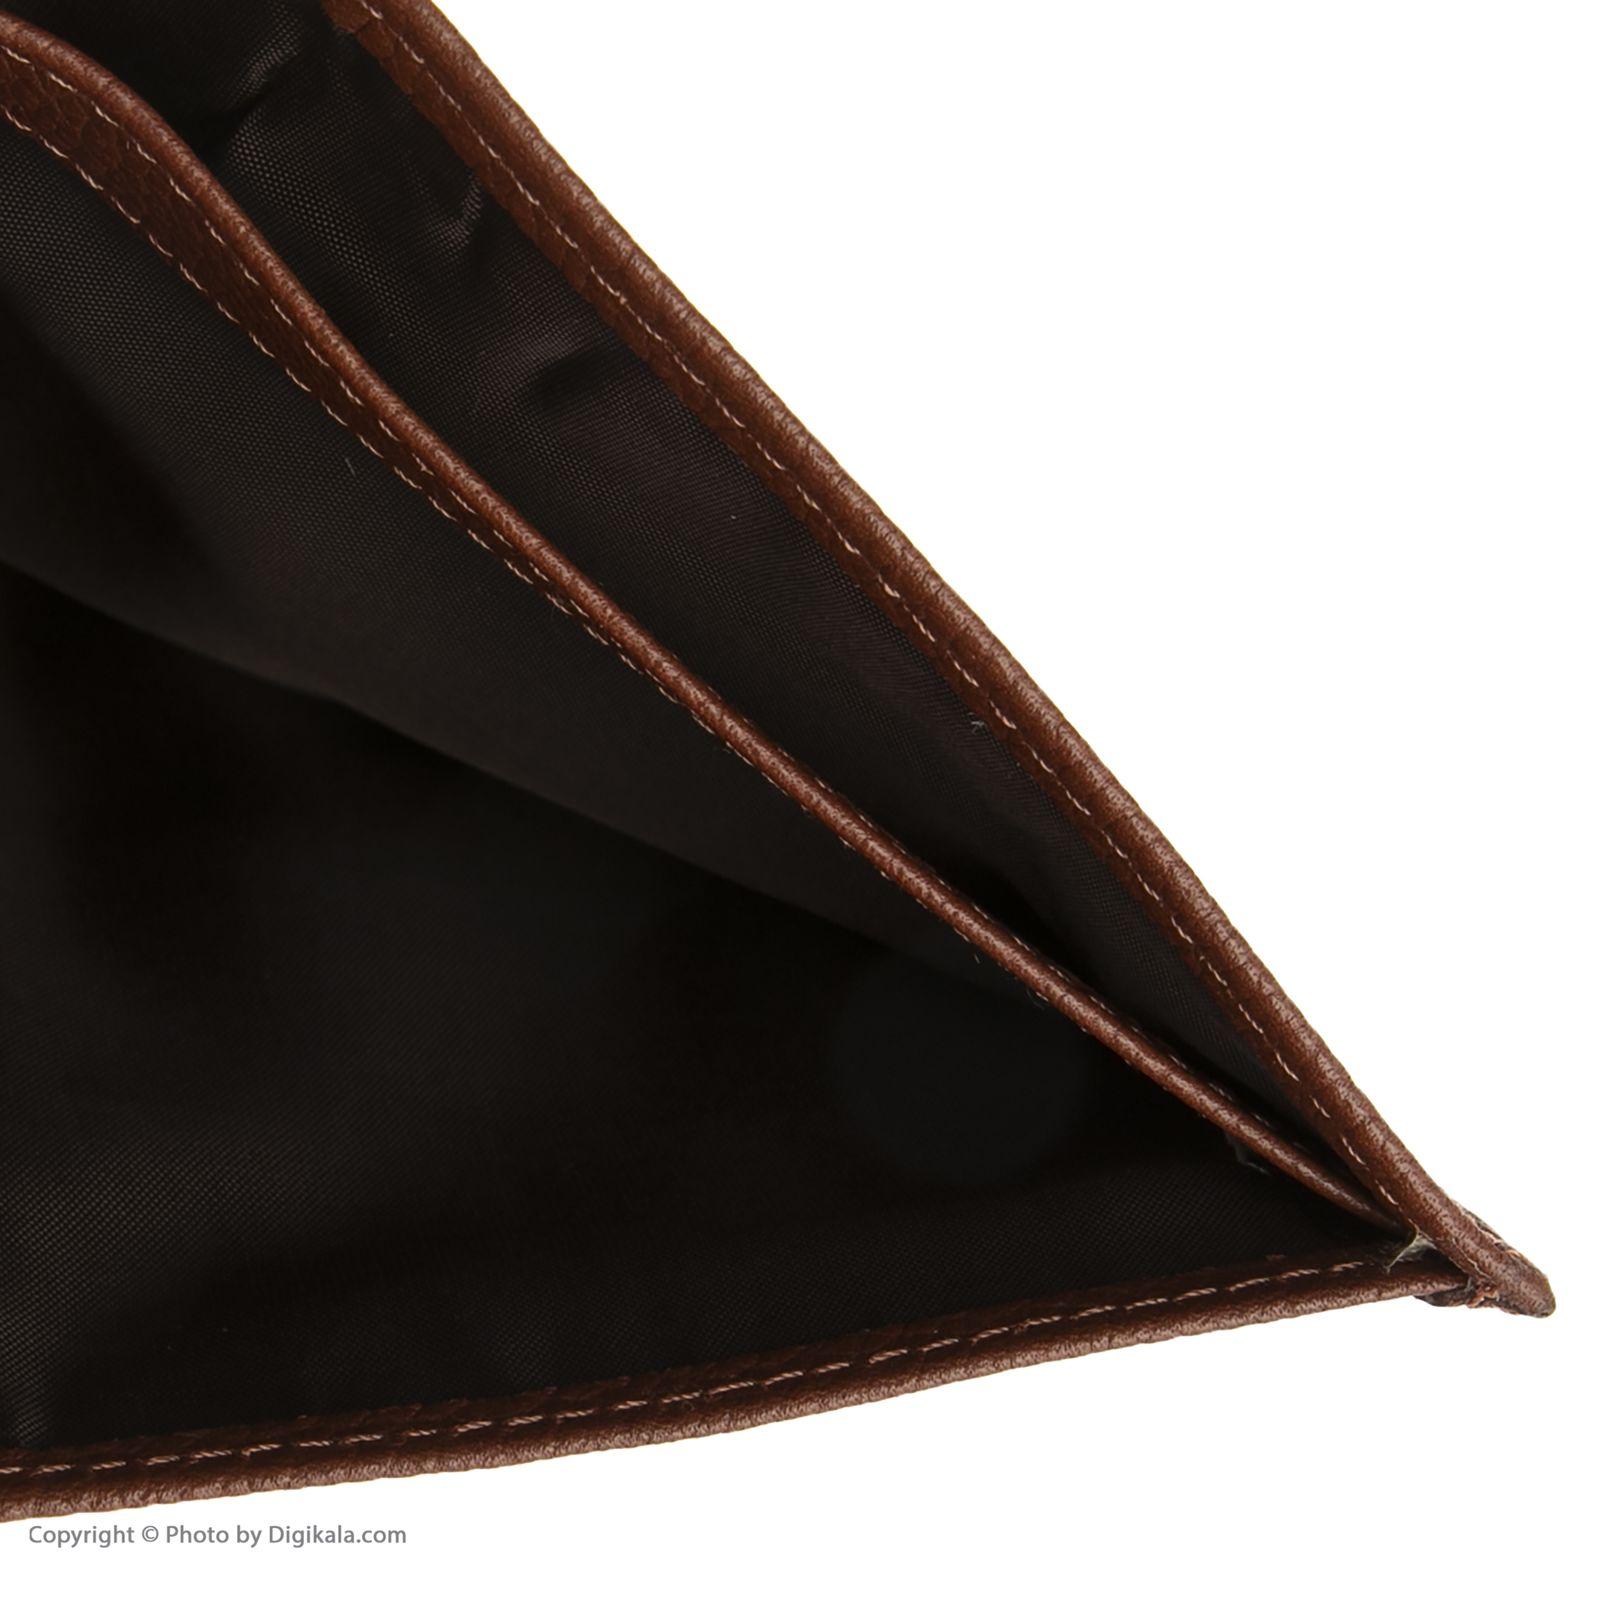 کیف پول مردانه چرمیران مدل 6057104 -  - 7